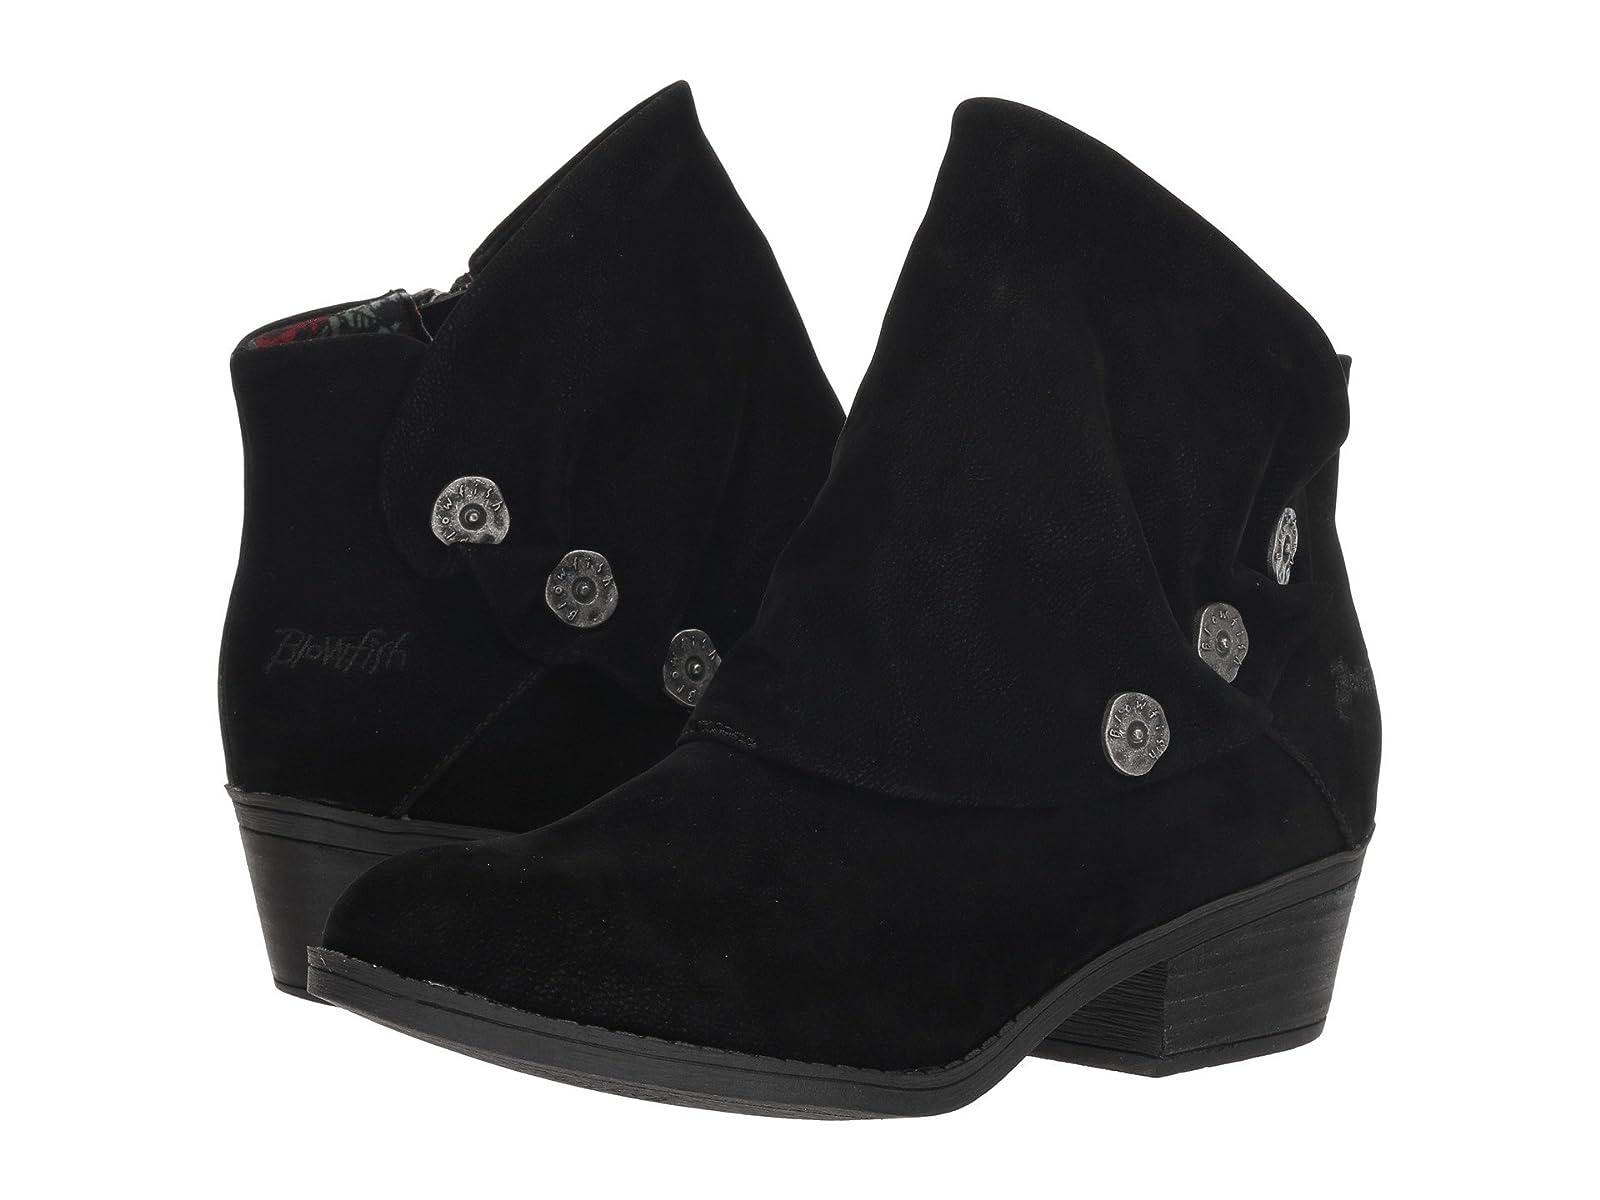 Blowfish SingeSelling fashionable and eye-catching shoes